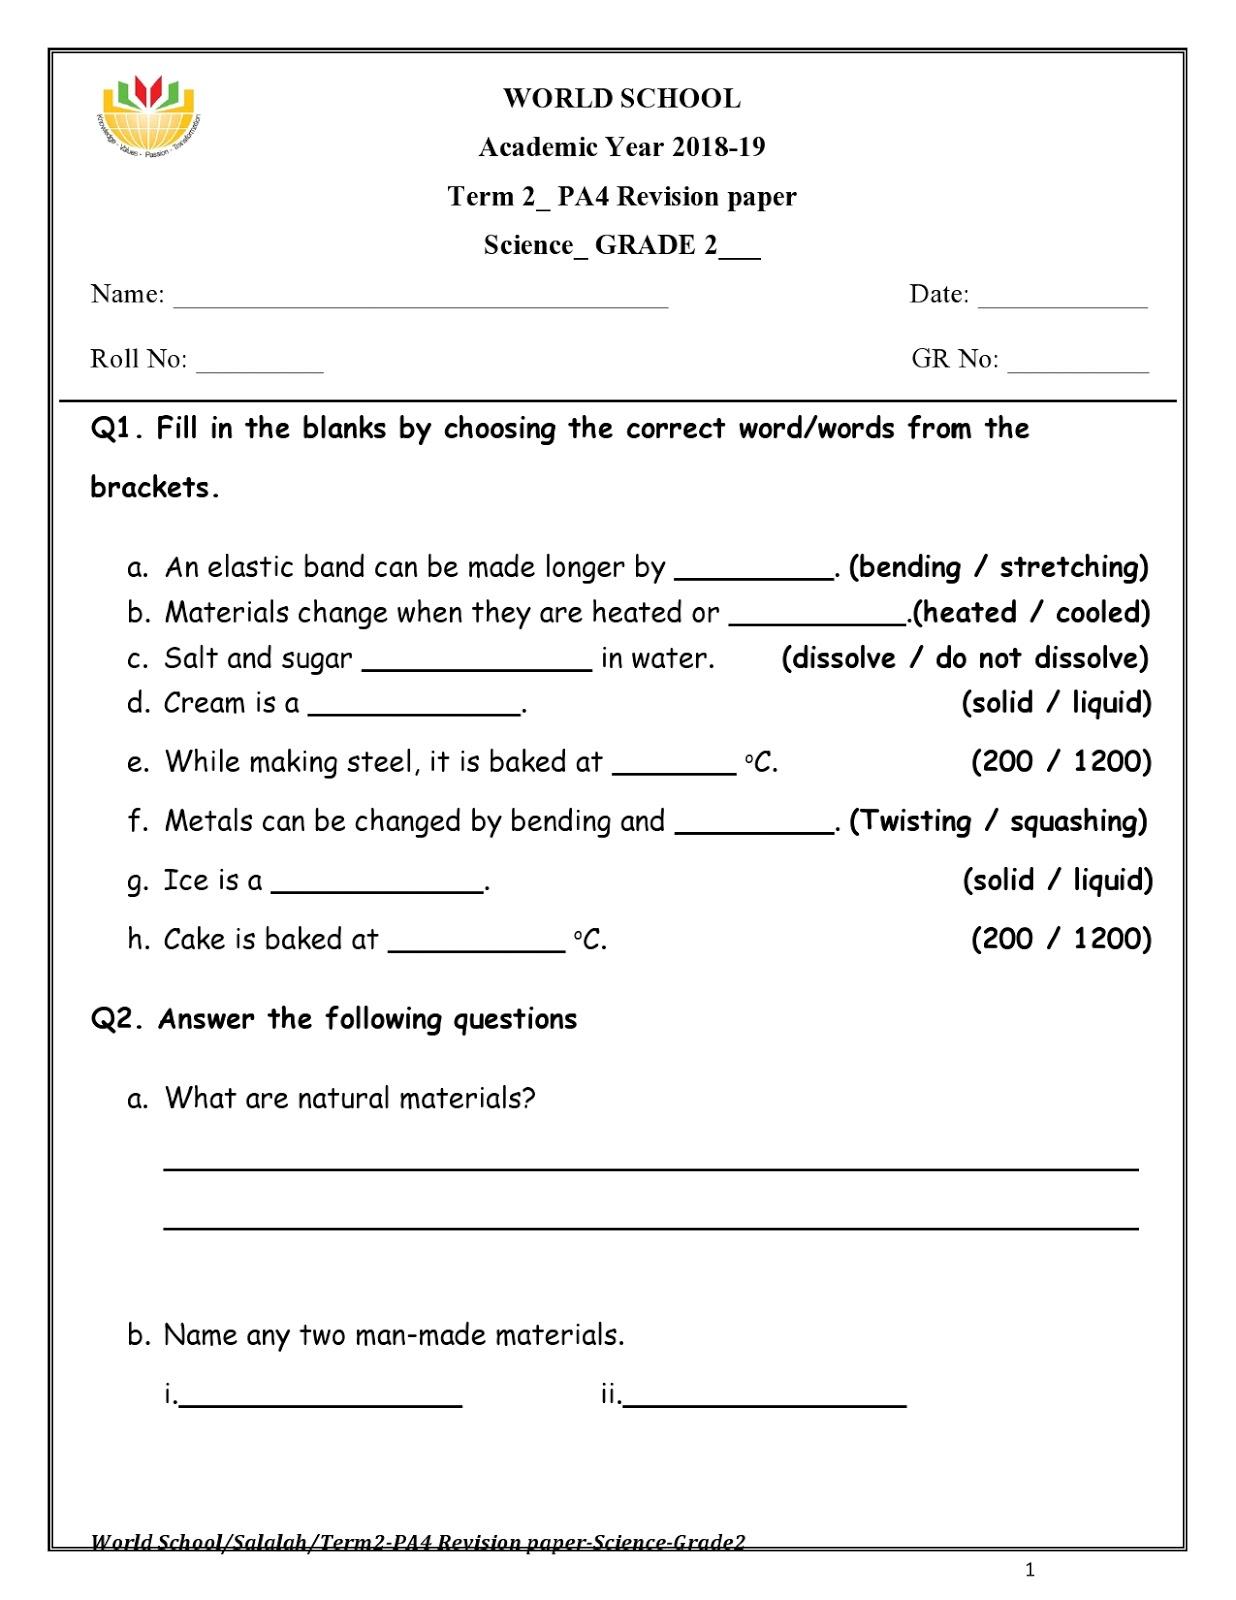 Birla World School Oman Homework For Grade 2 As On 08 04